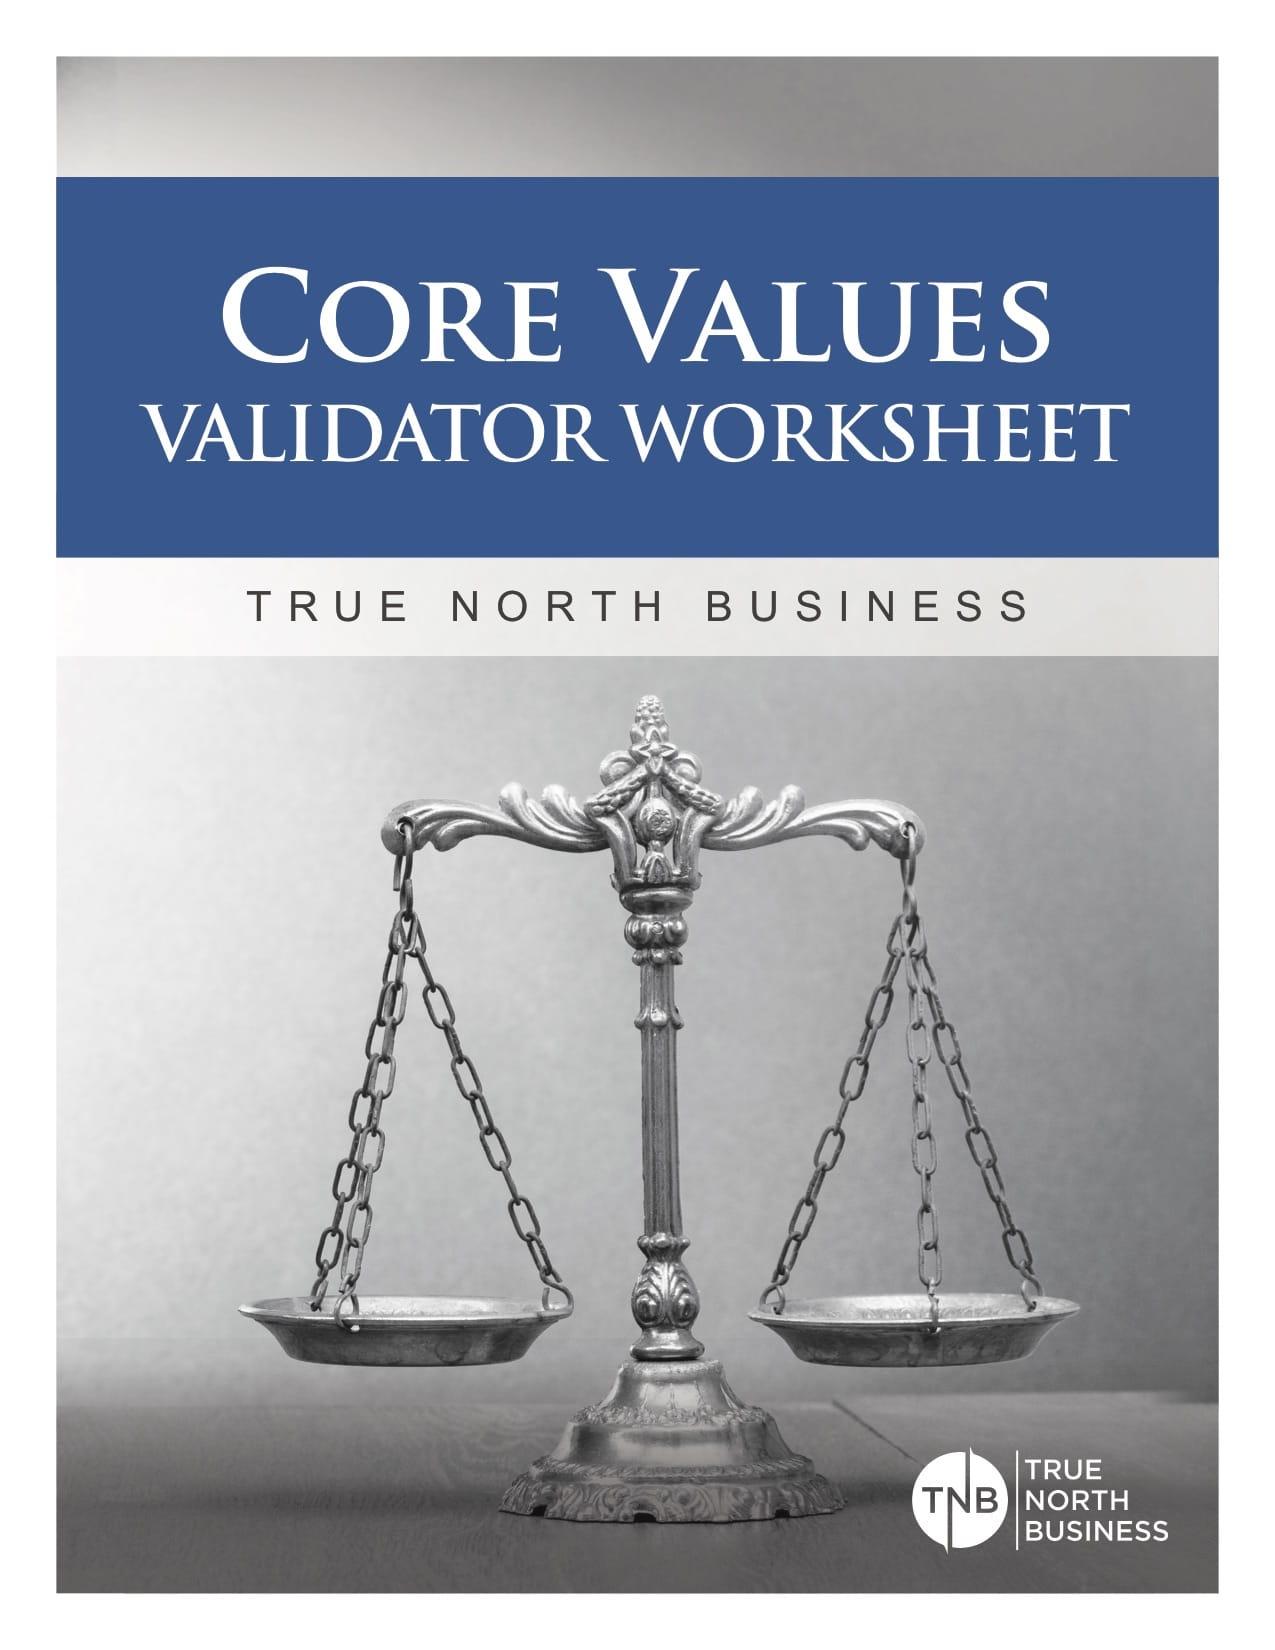 Core Values Validator Worksheet V2